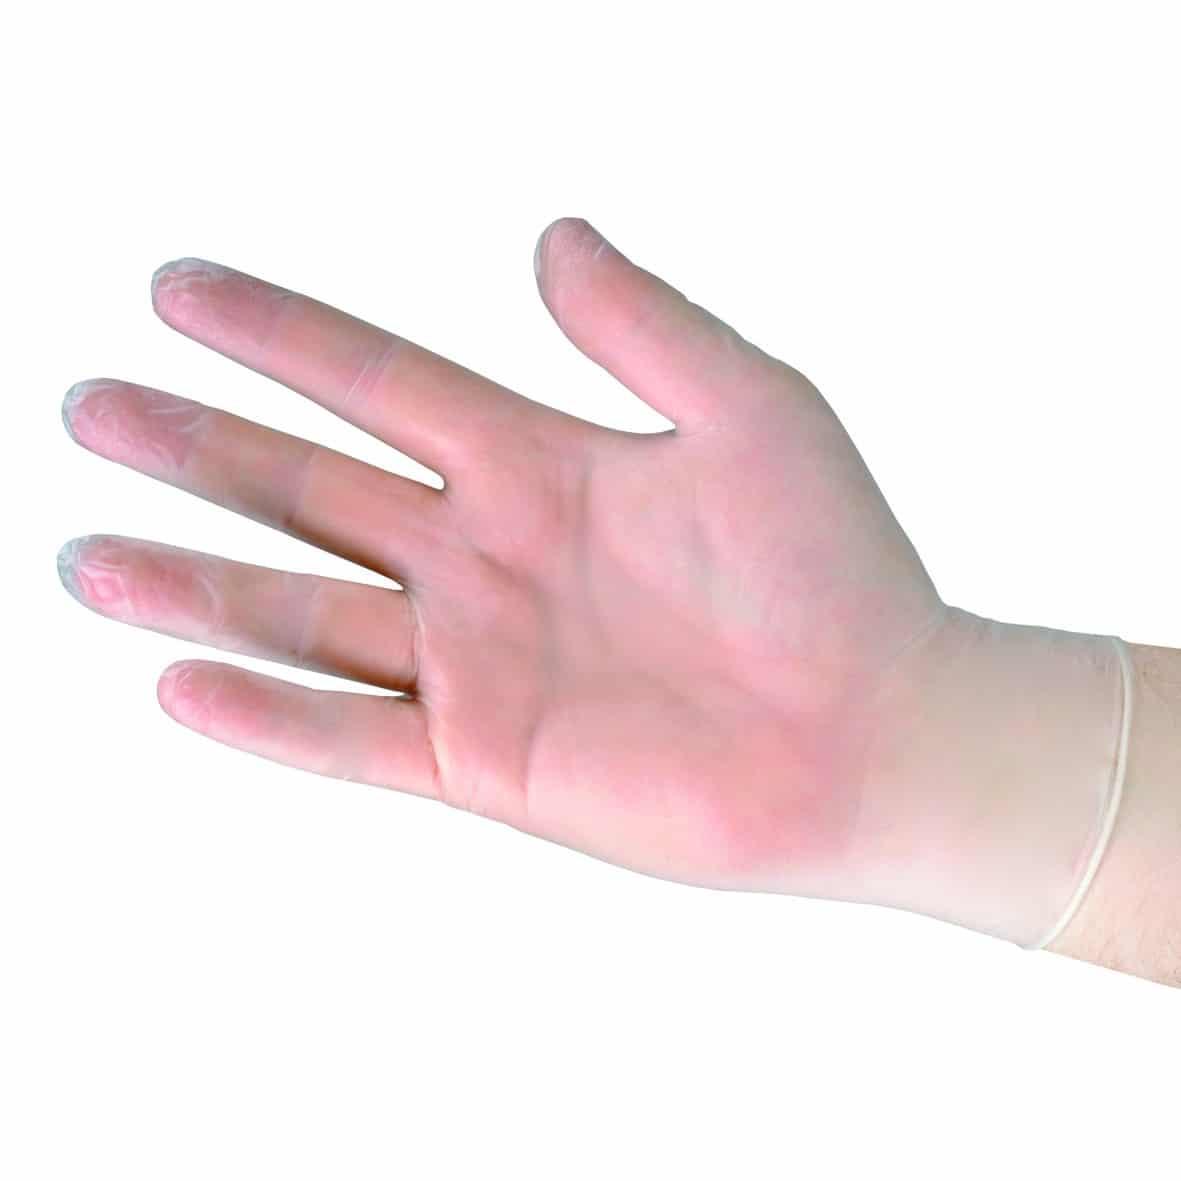 Bowers Medical Derma Sheer Vinyl Gloves 2